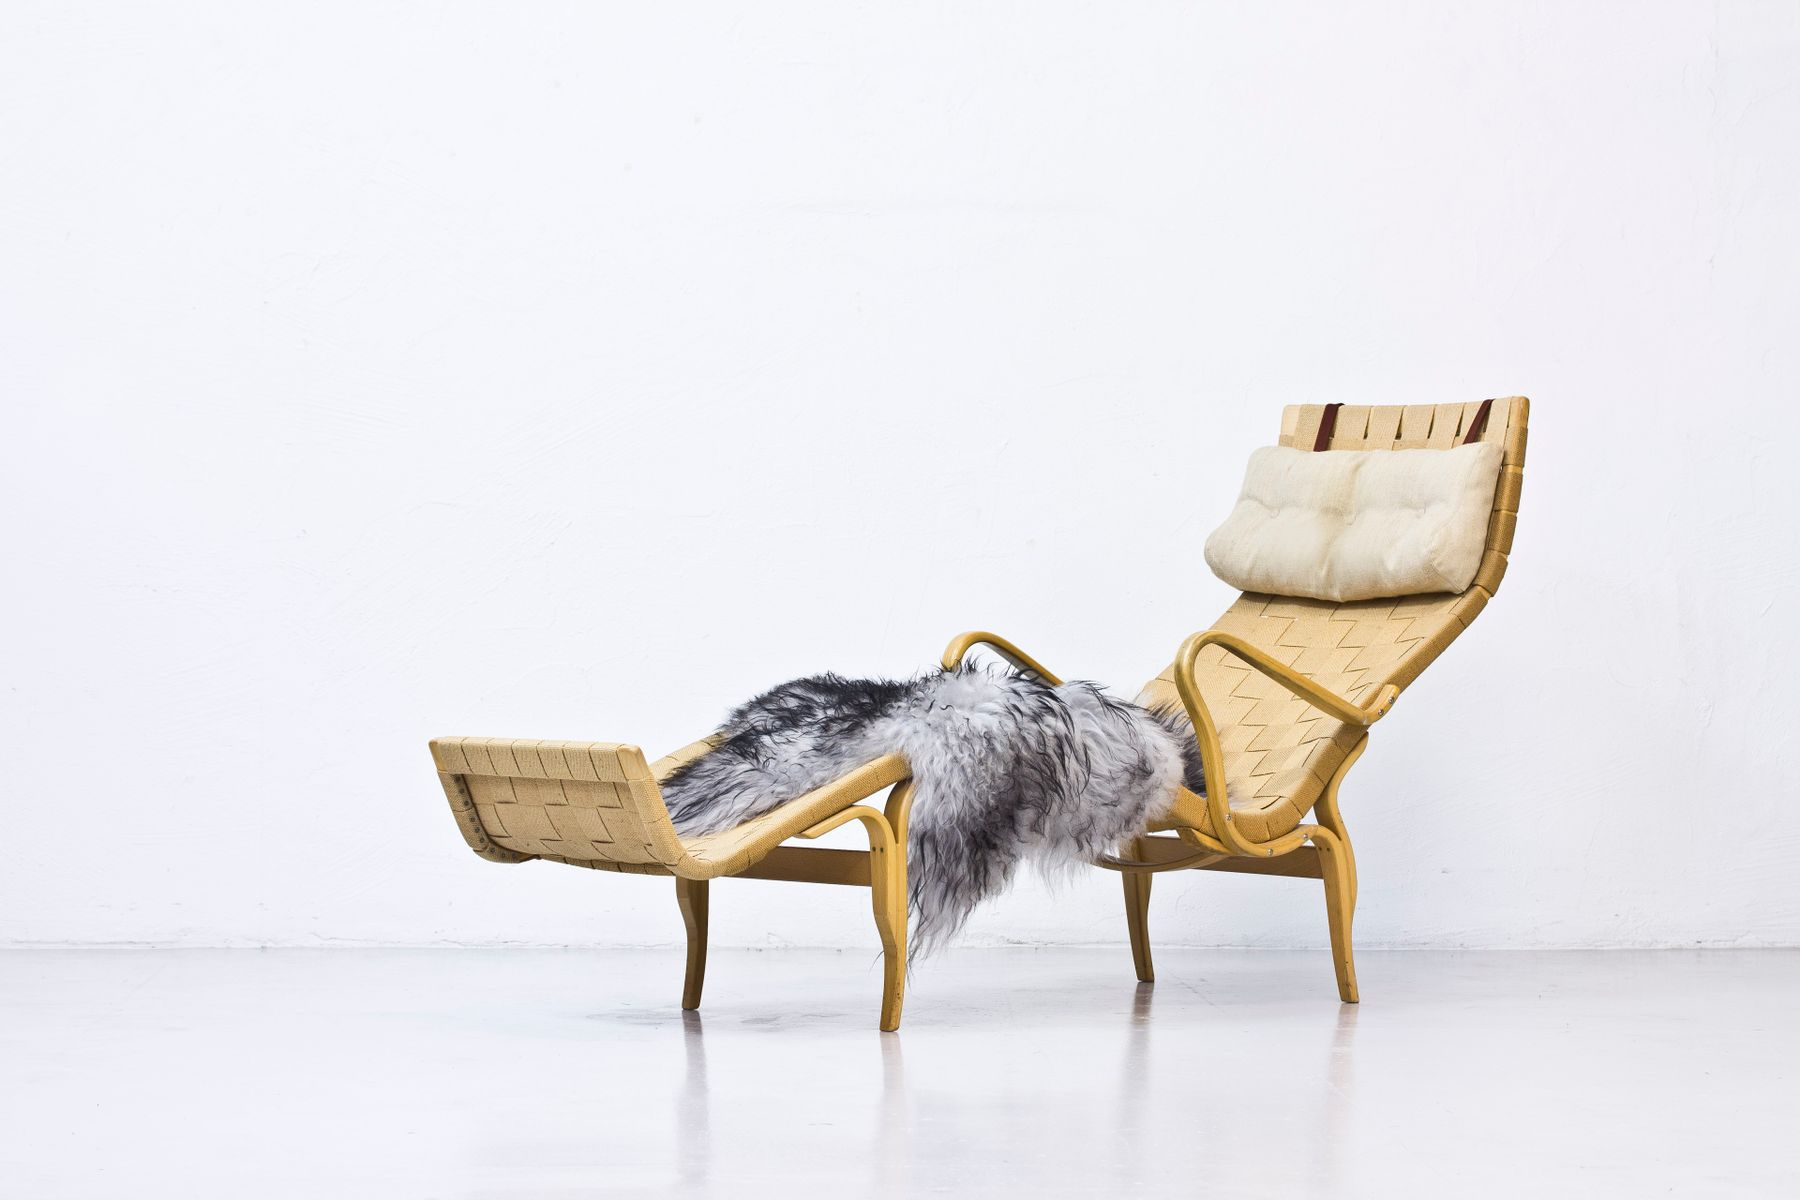 Pernilla 3 Lounge Chair by Bruno Mathsson for Karl Mathsson 1961